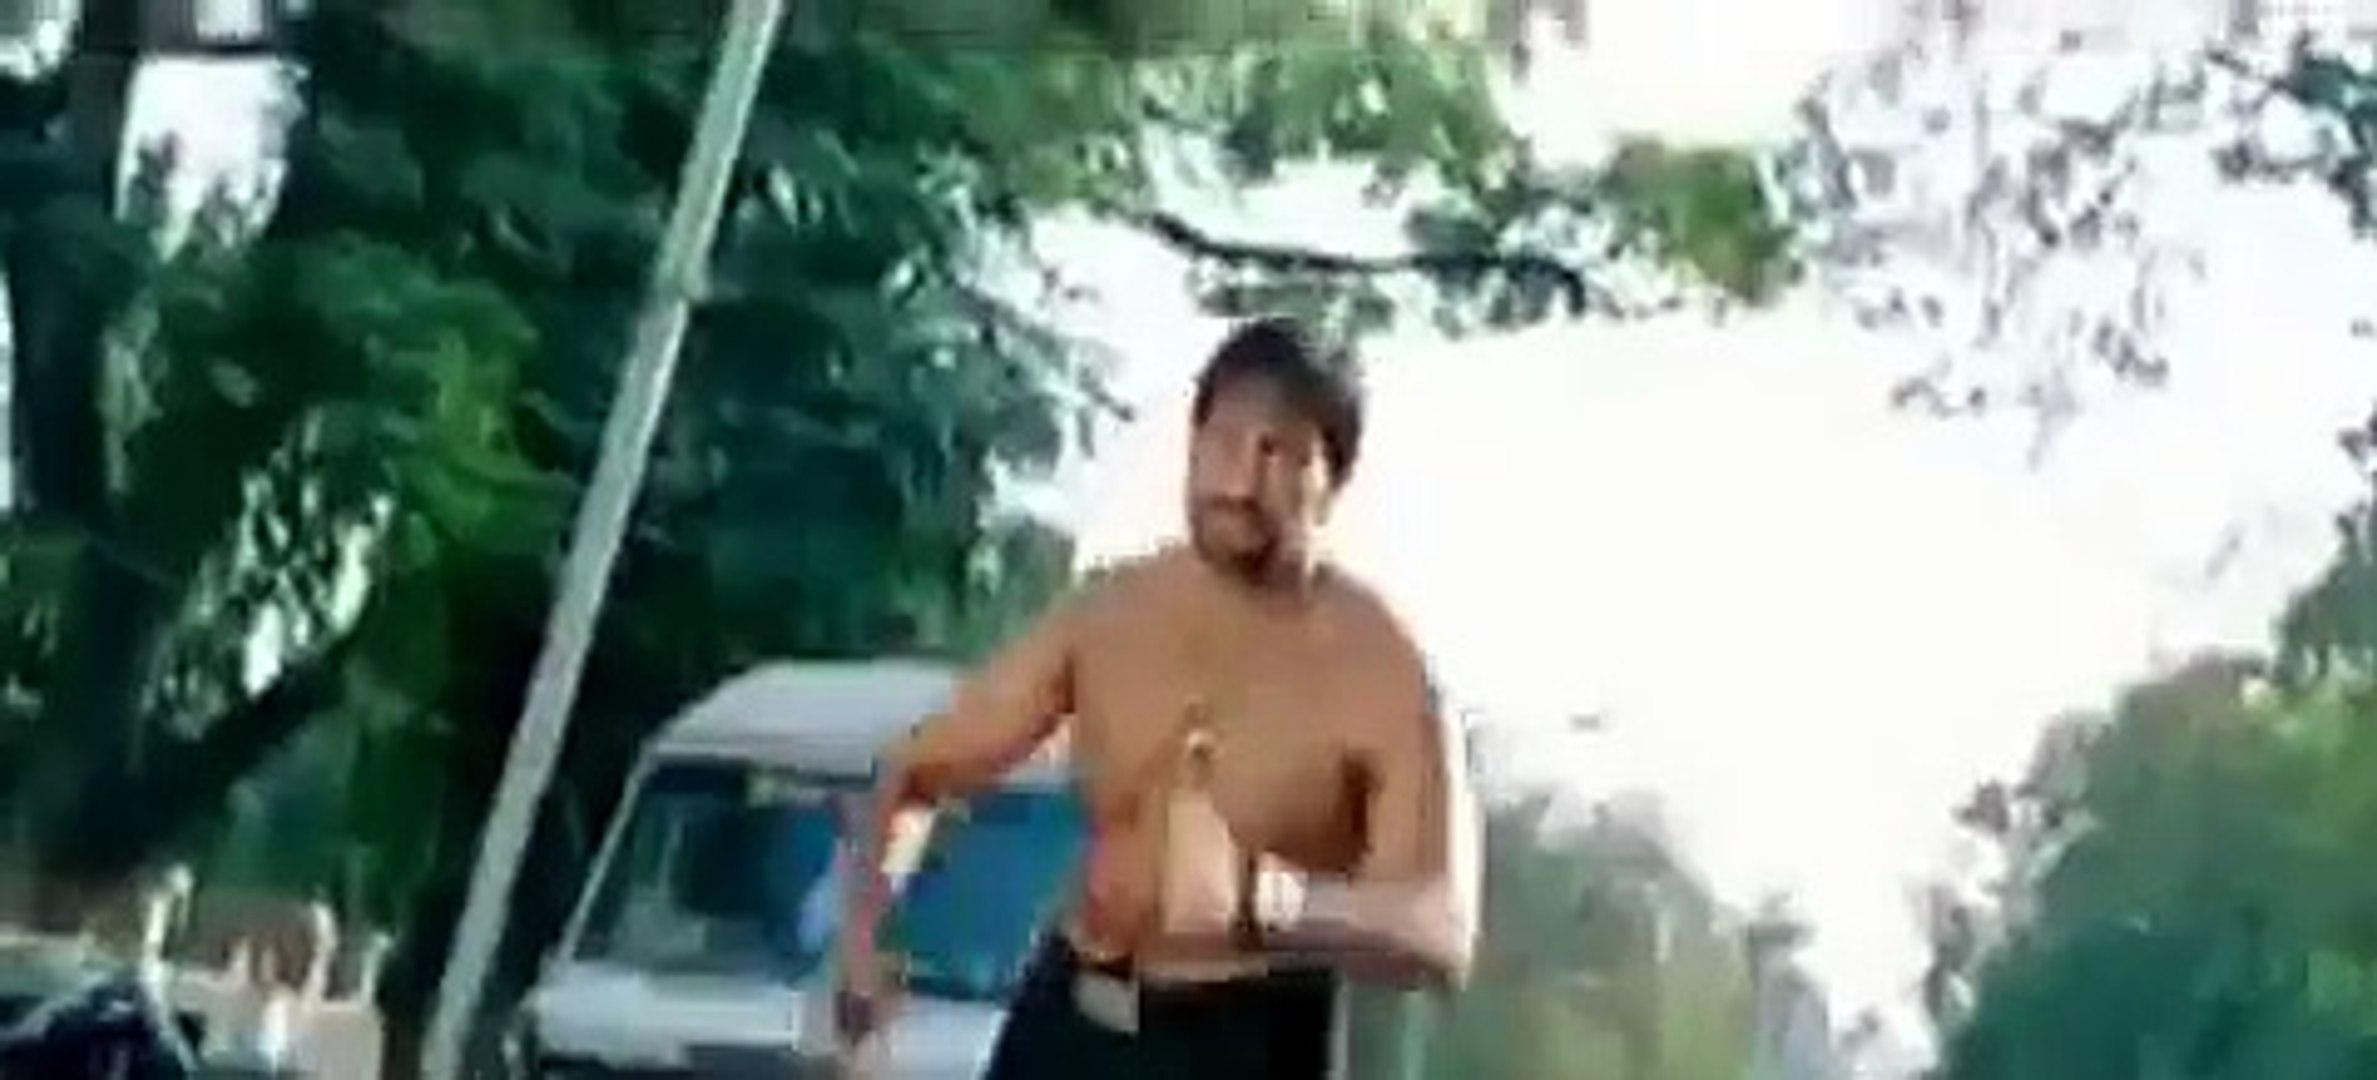 Additional that khalnayak Aur - BOLD MASALA Film Promo Trailer